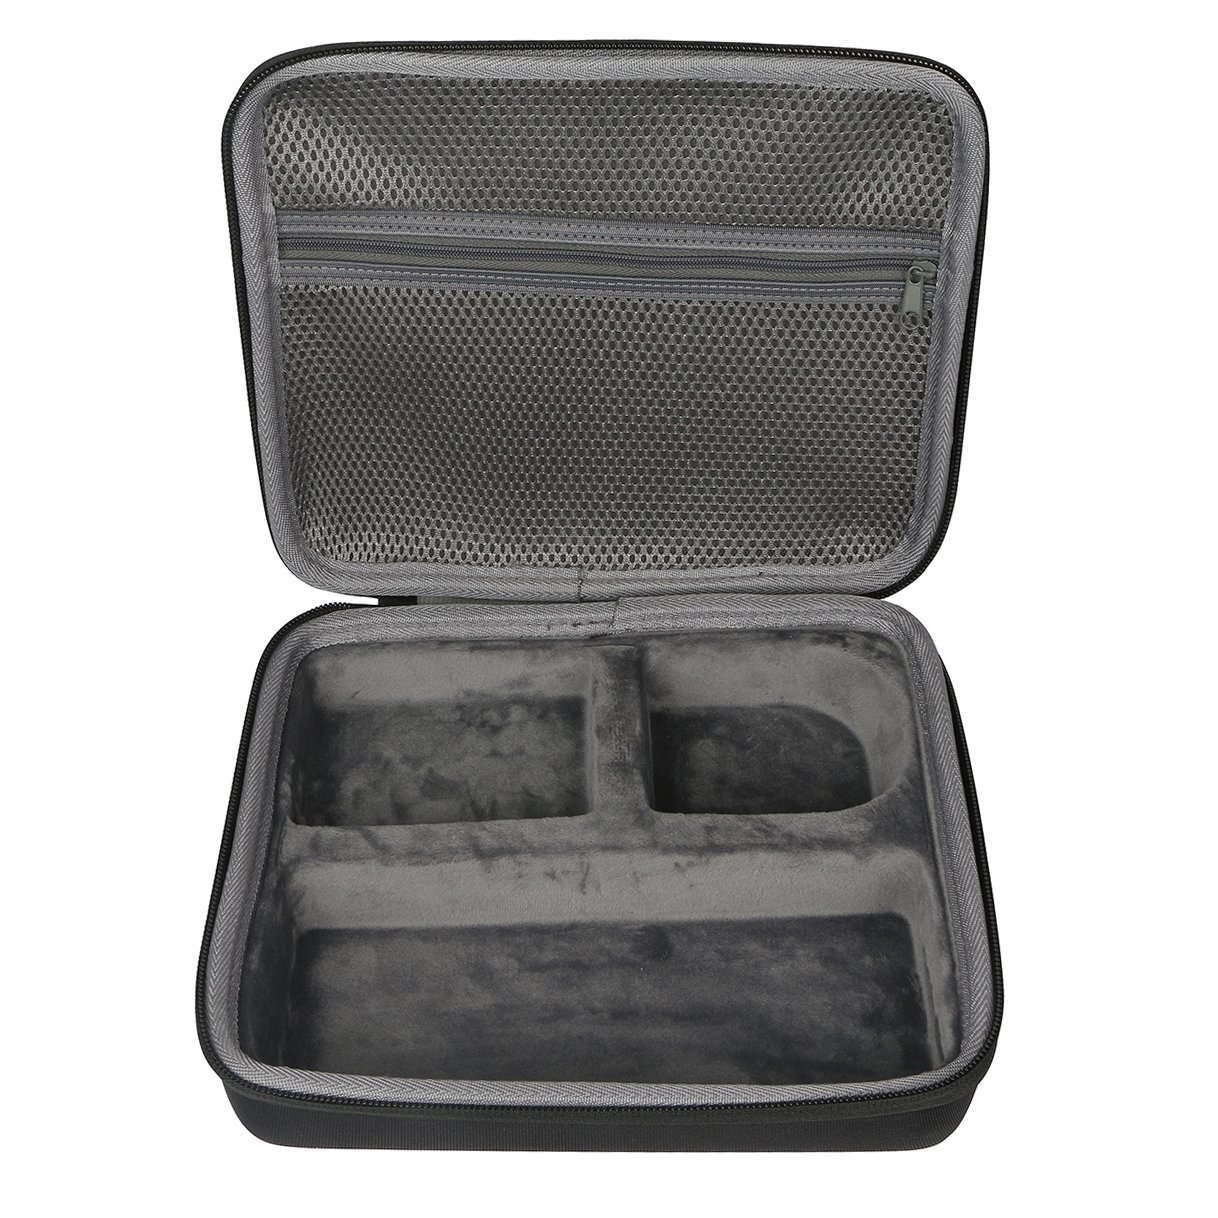 Hard Travel Case For Remington Hc4250 Shortcut Pro Self Haircut Kit